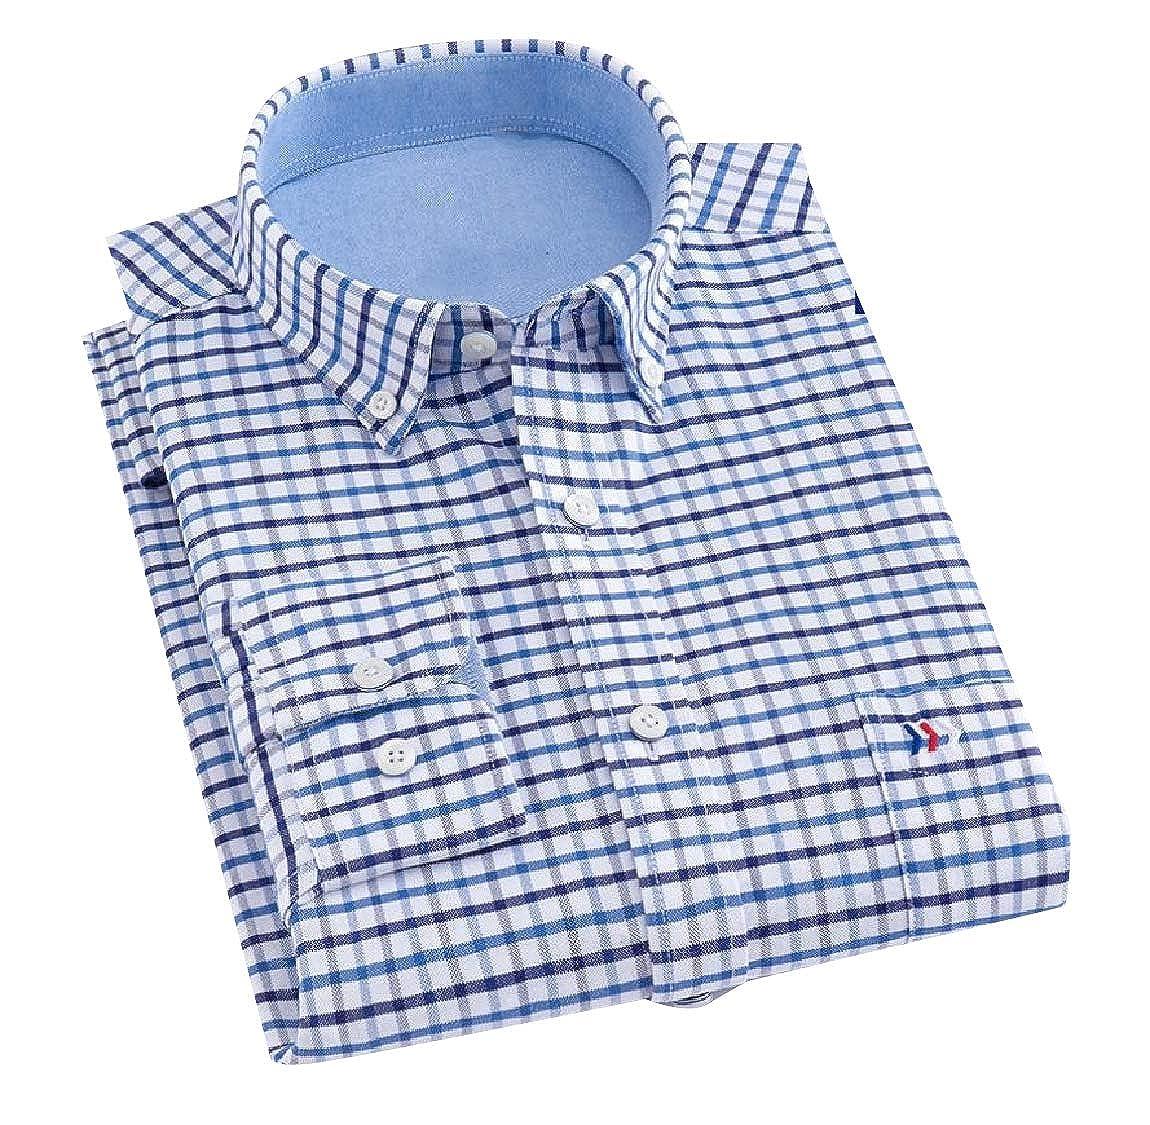 YUNY Mens Long-Sleeve Plaid Cozy Formal Classic Oxford Poplin Shirt 26 L